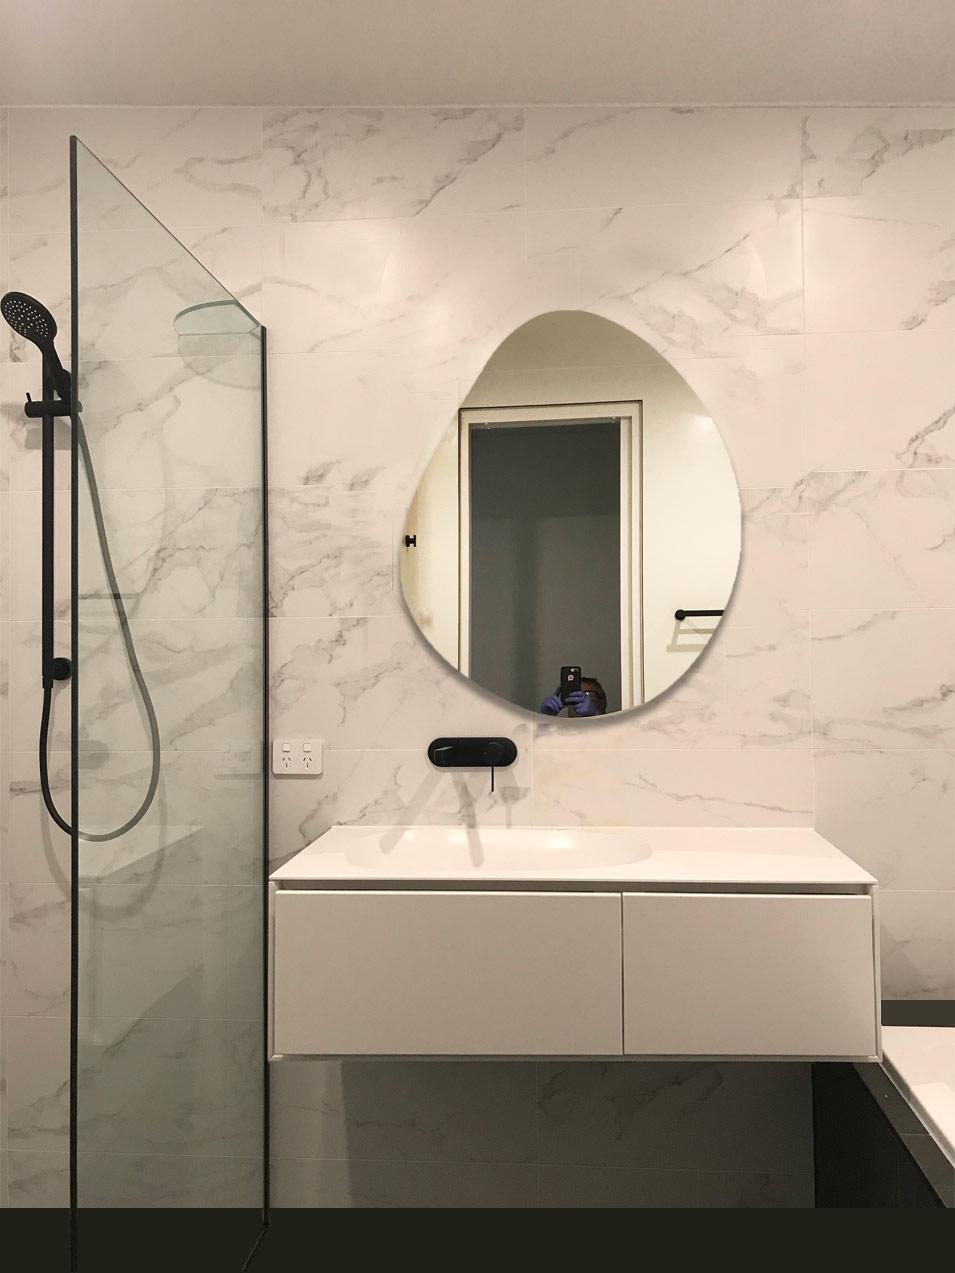 Beautiful Mirrors Bathroom Mirrors Melbourne Malvern Medicine Bathroom Mirrors Melbourne Malvern